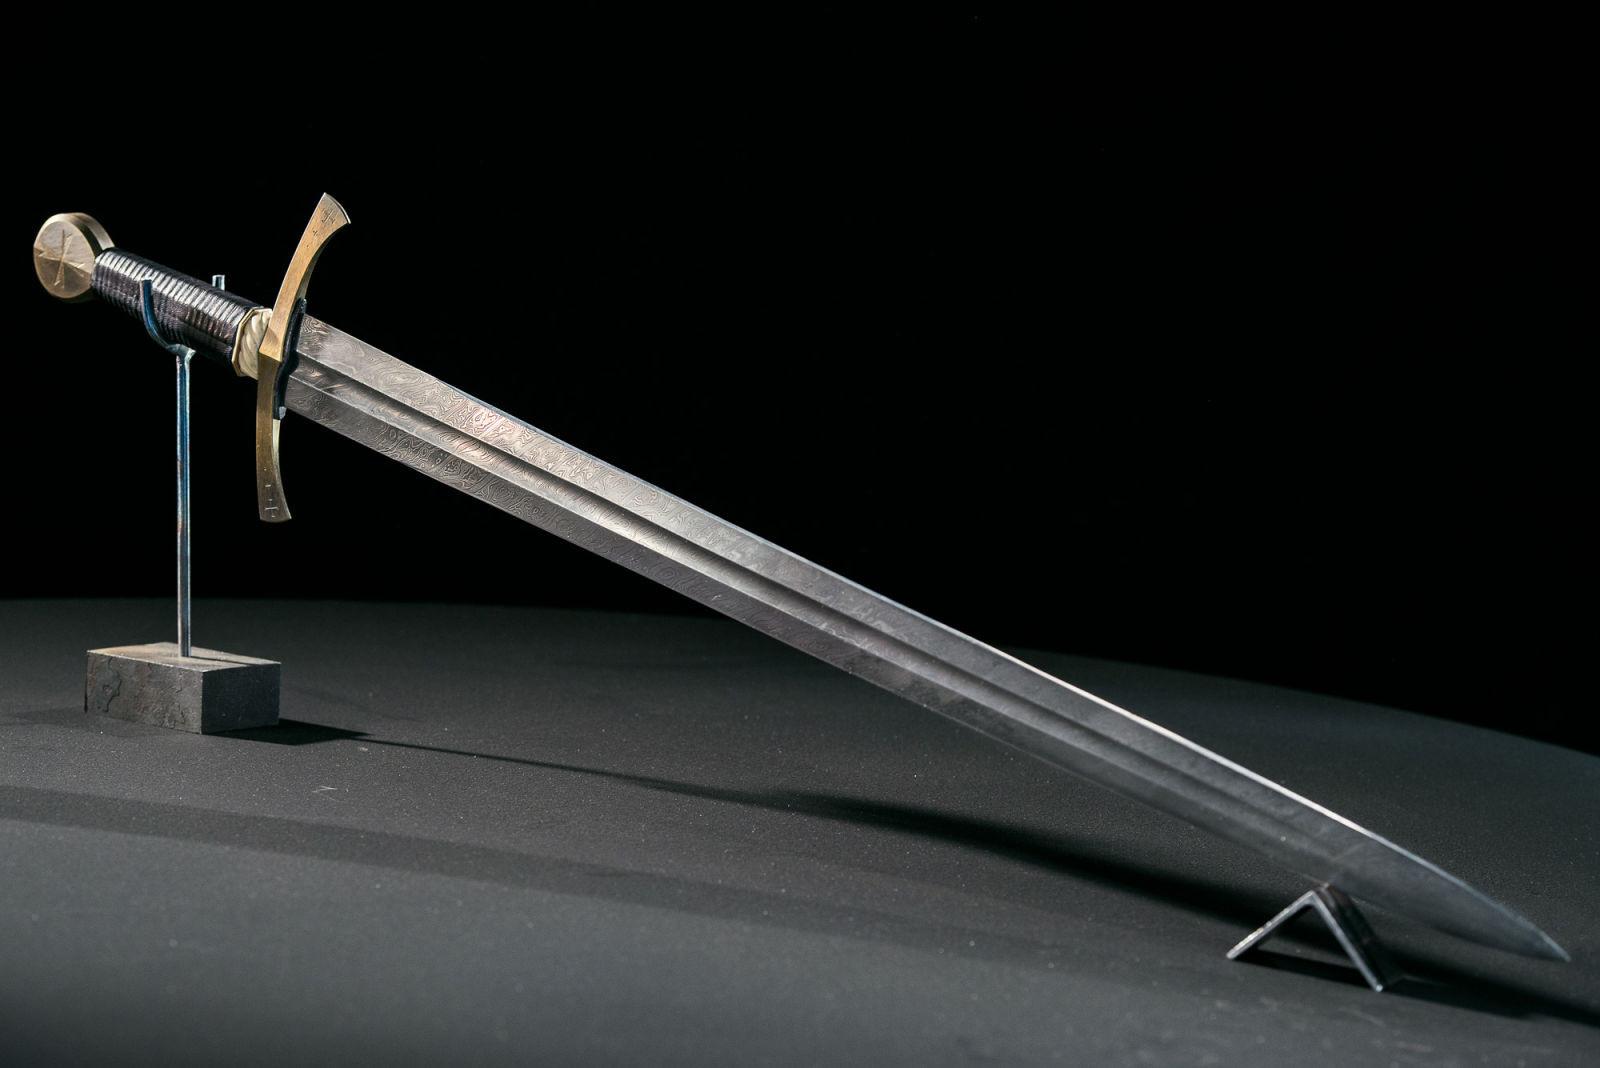 меч шеркон фото возражала против объективов